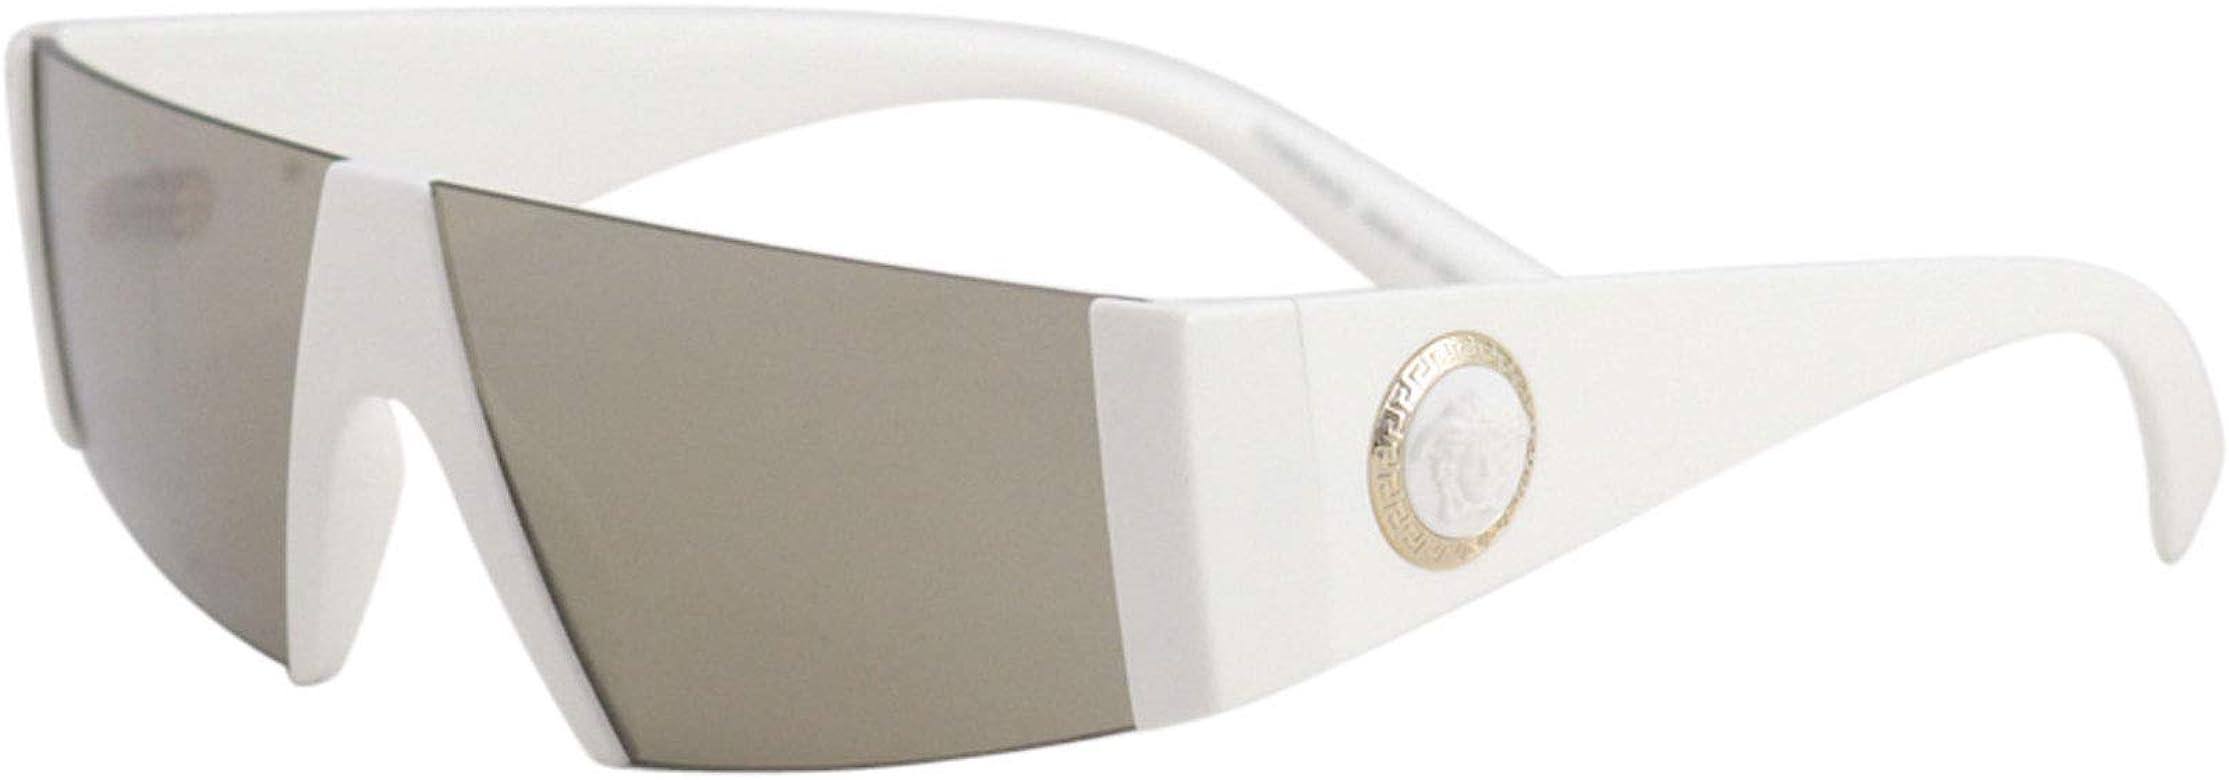 Versace 0VE4360 Gafas de sol, White, 45 para Hombre: Amazon ...